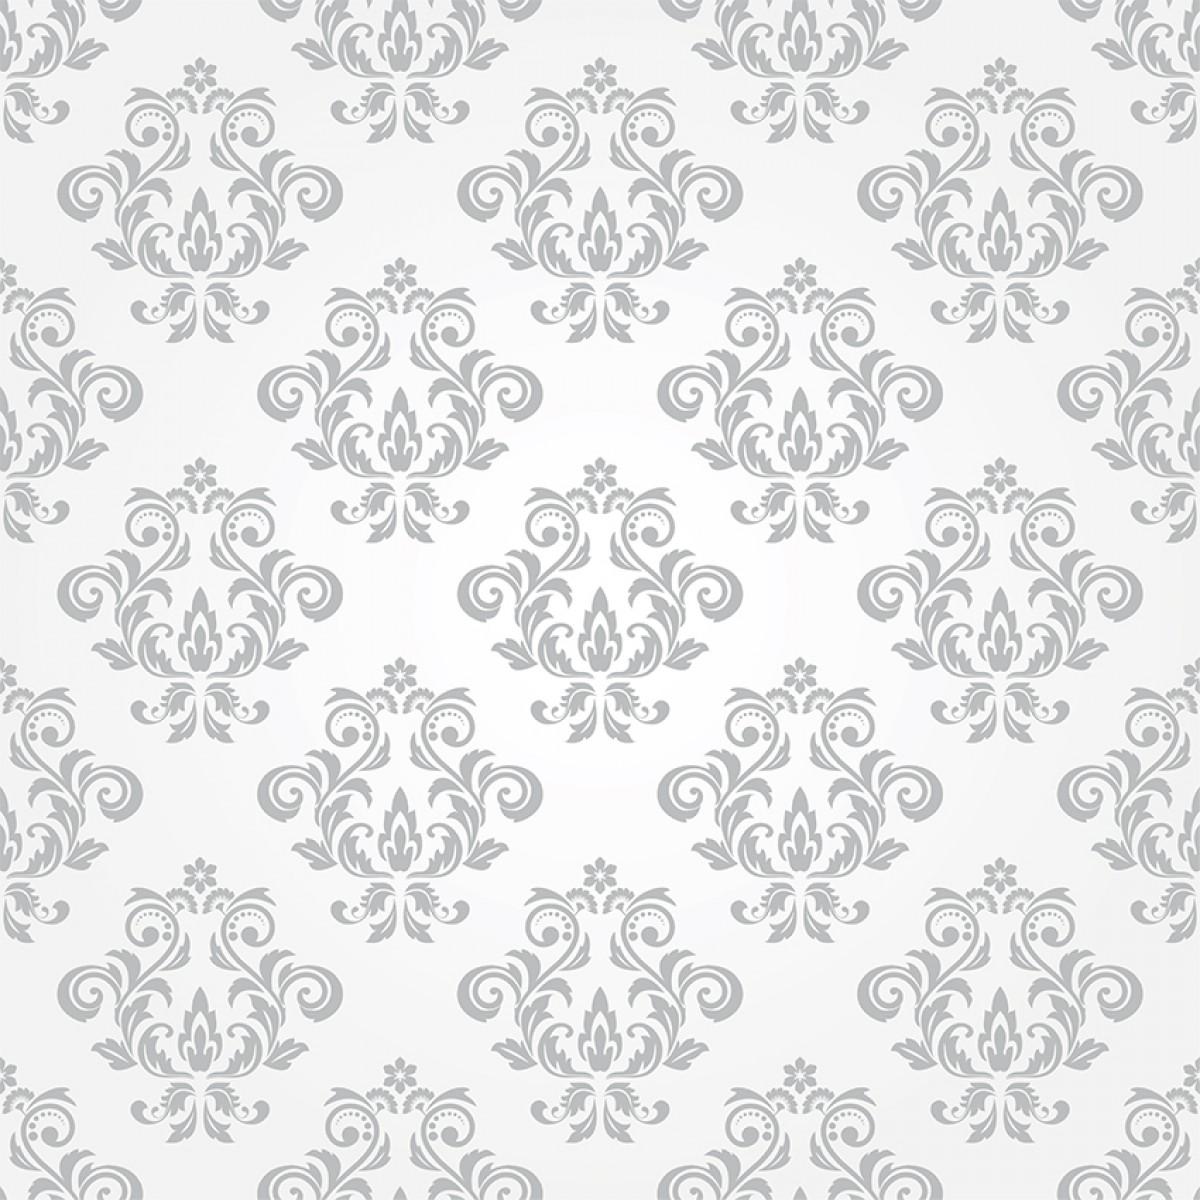 Papel de parede singular print decor elo7 - Papel para paredes de dormitorios ...